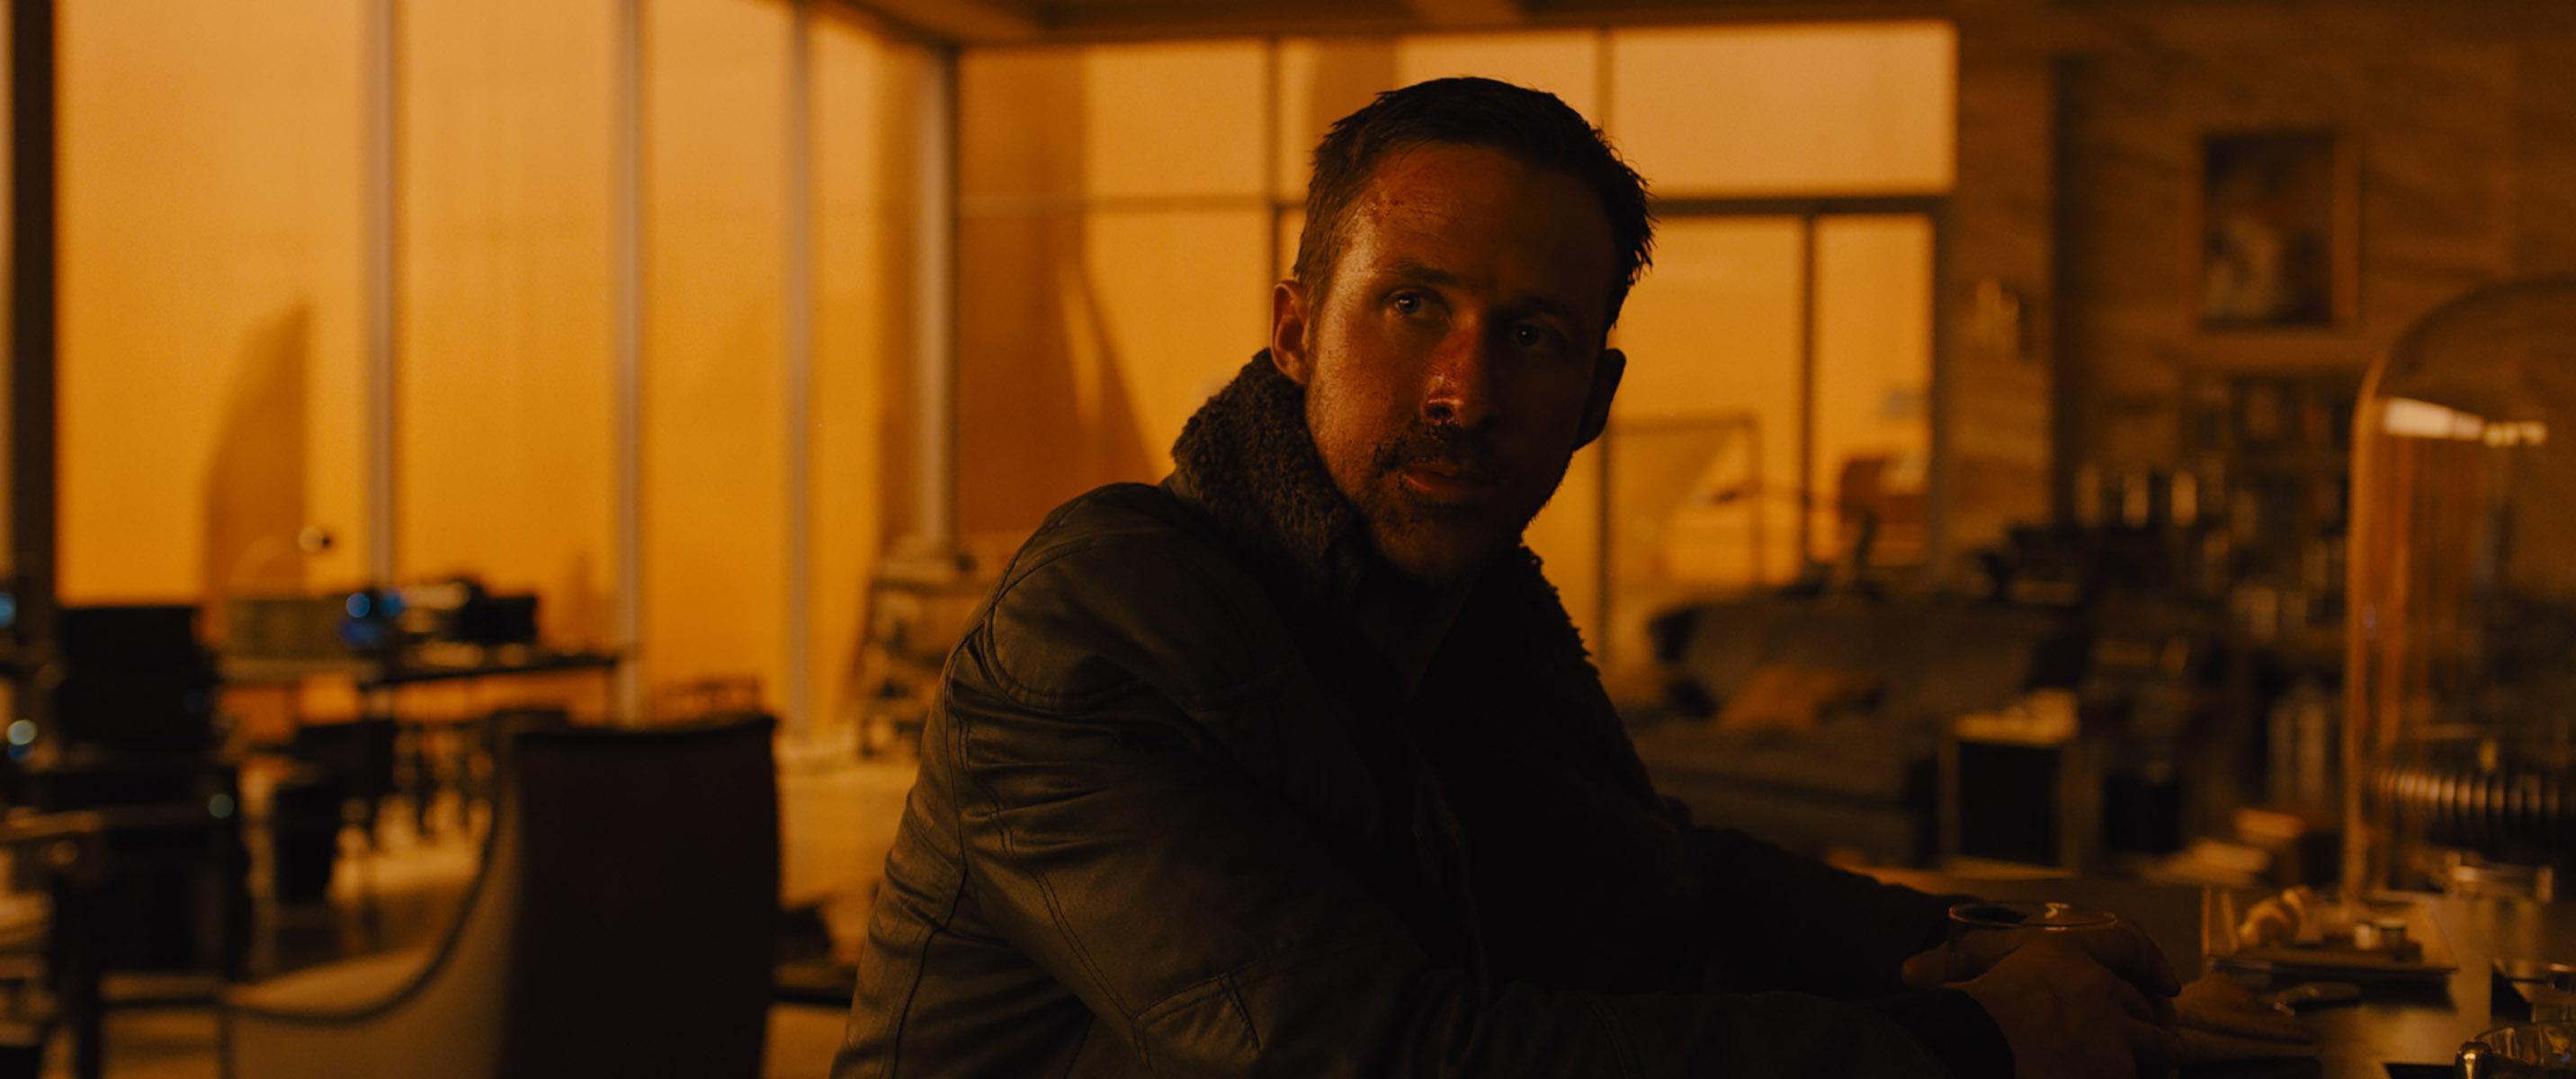 Blade Runner 2049 (2017, USA, d. Denis Villeneuve, 163 minutes)